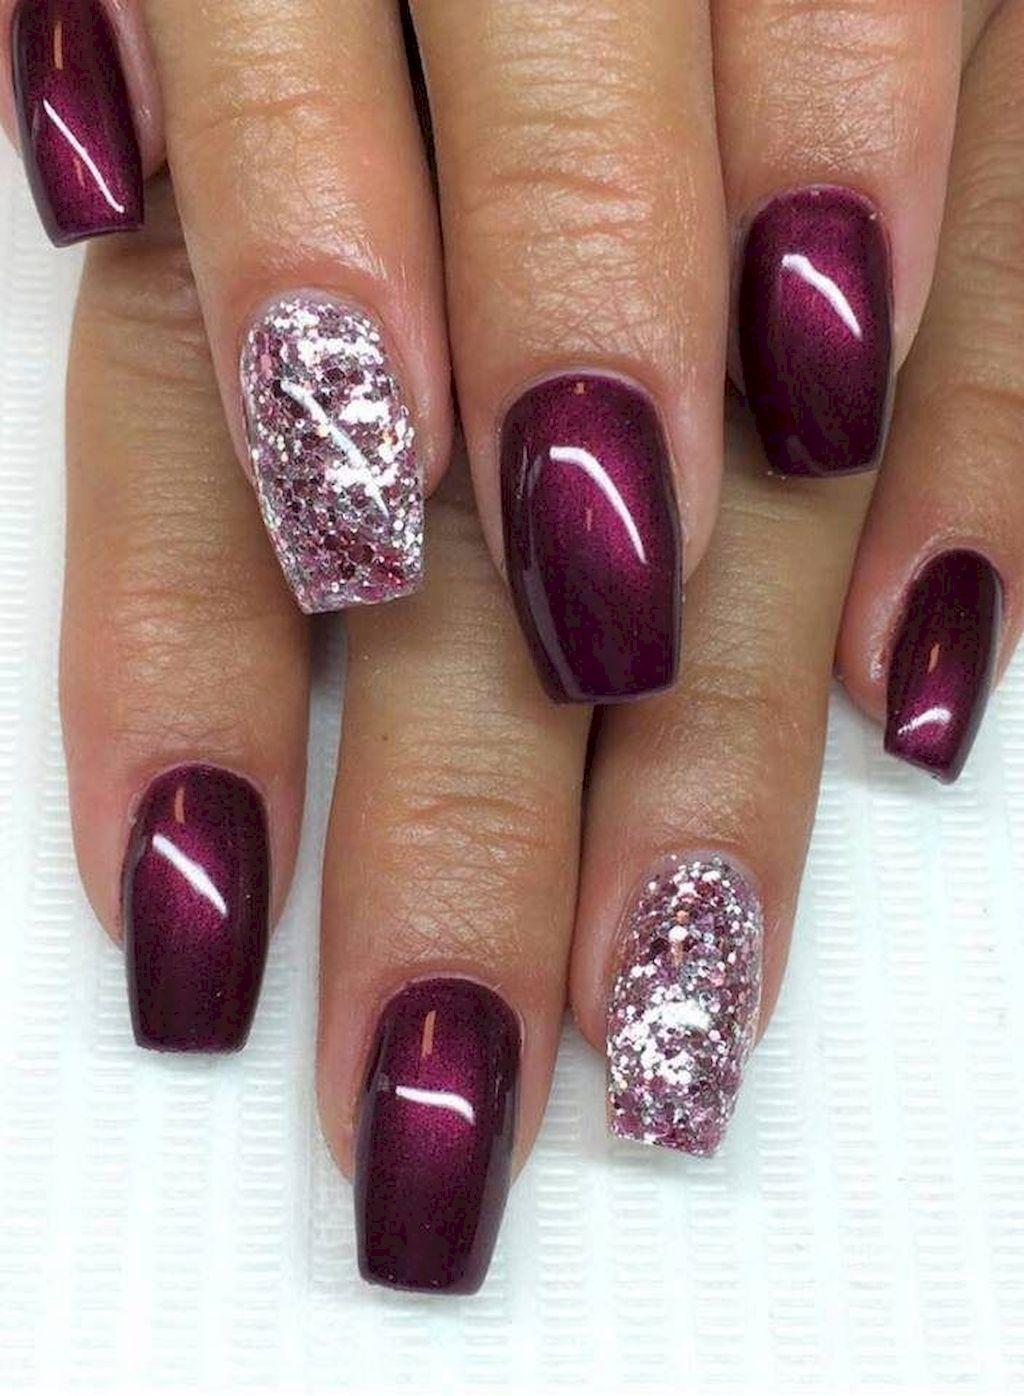 67 Easy Winter Nail Art Ideas | Pinterest | Winter nail art, Winter ...